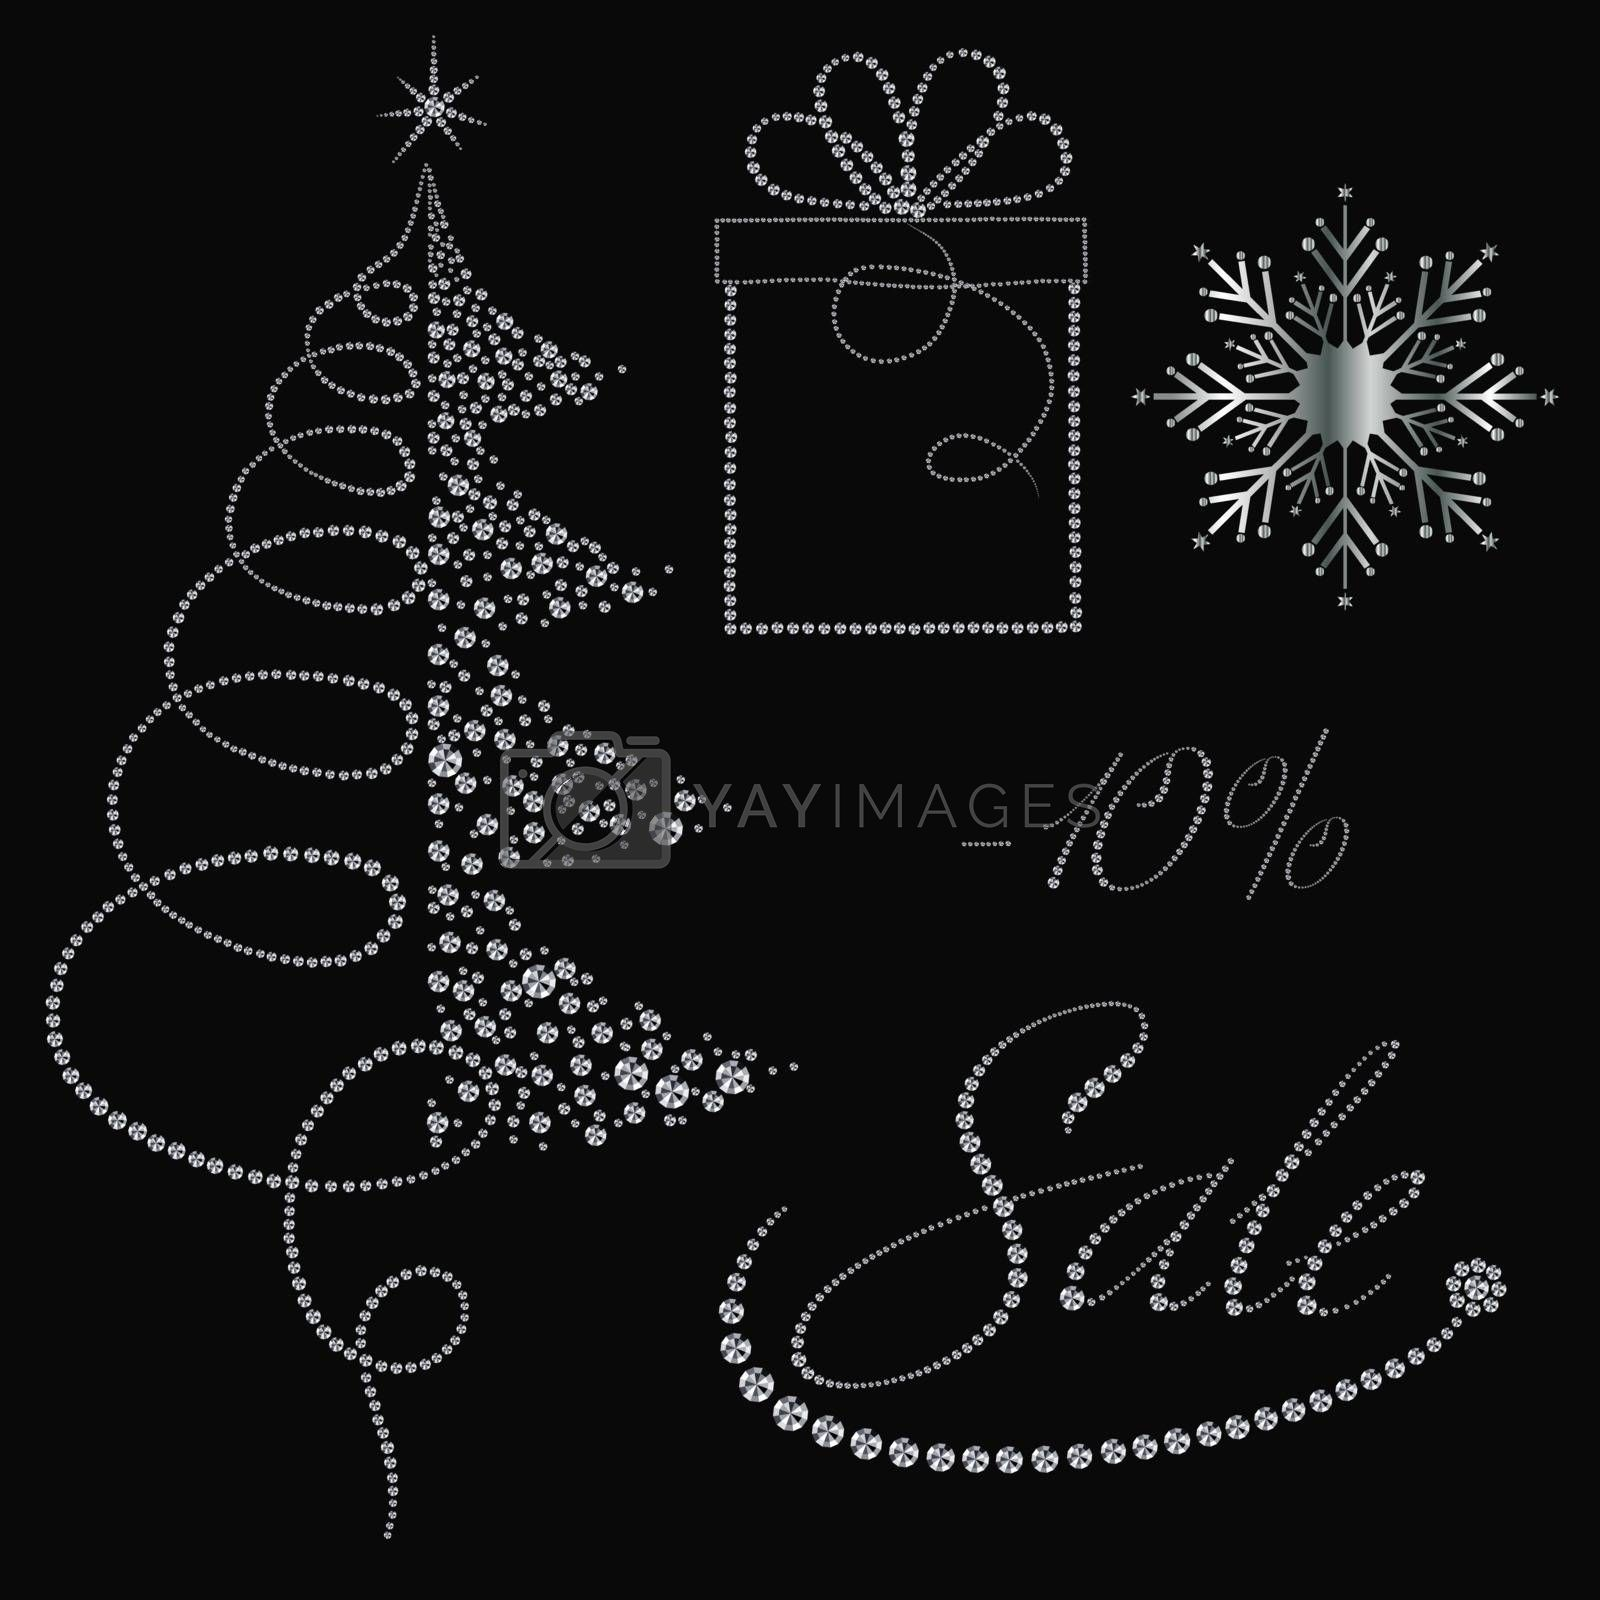 Festive diamonds Christmas items collection for Christmas sale banners